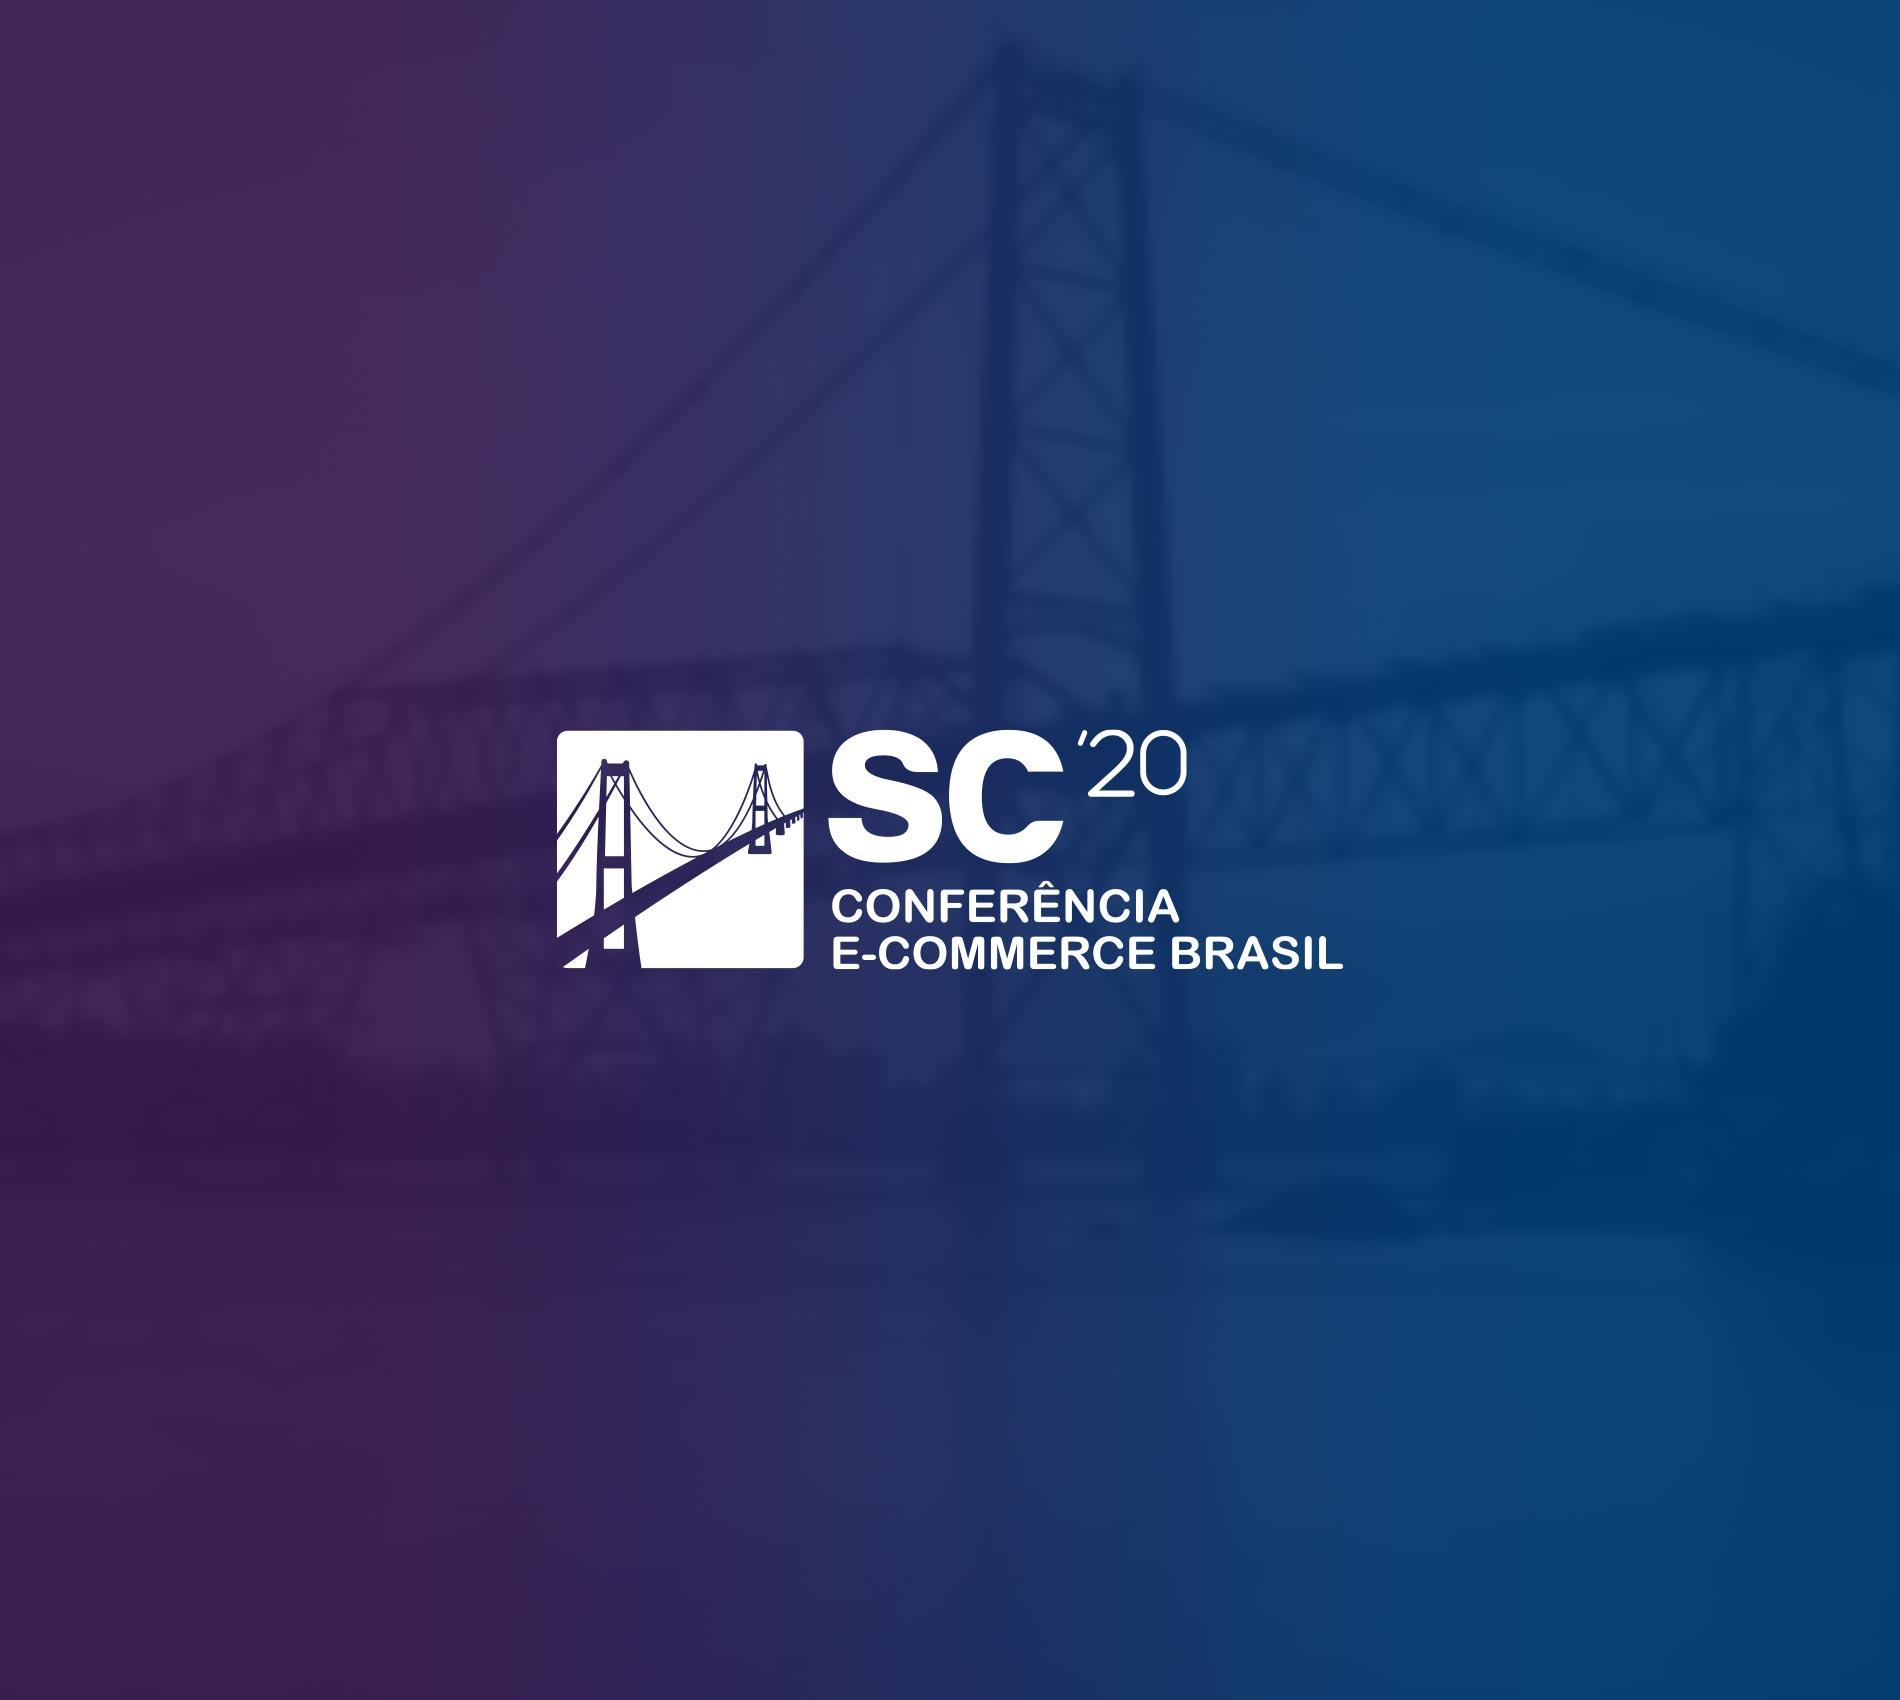 Conferência E-commerce Brasil SC 2020